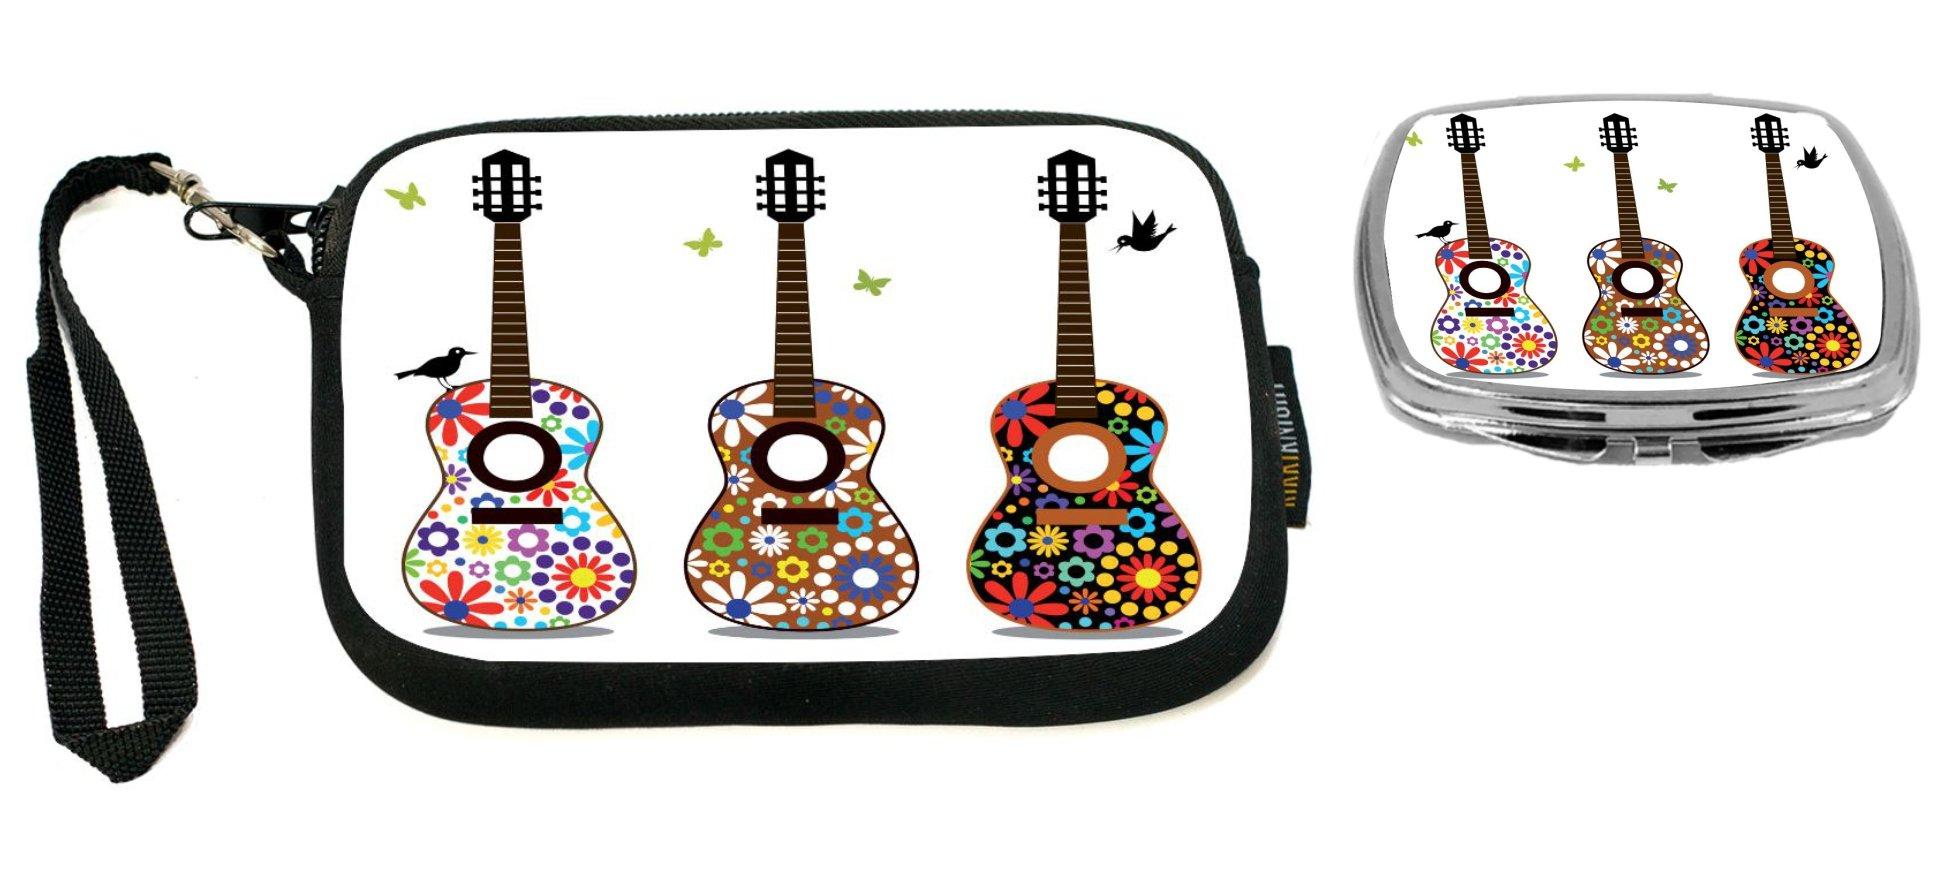 Rikki Knight Hippy 60's Flower Power Guitars Design Neoprene Clutch Wristlet with Matching Square Compact Mirror